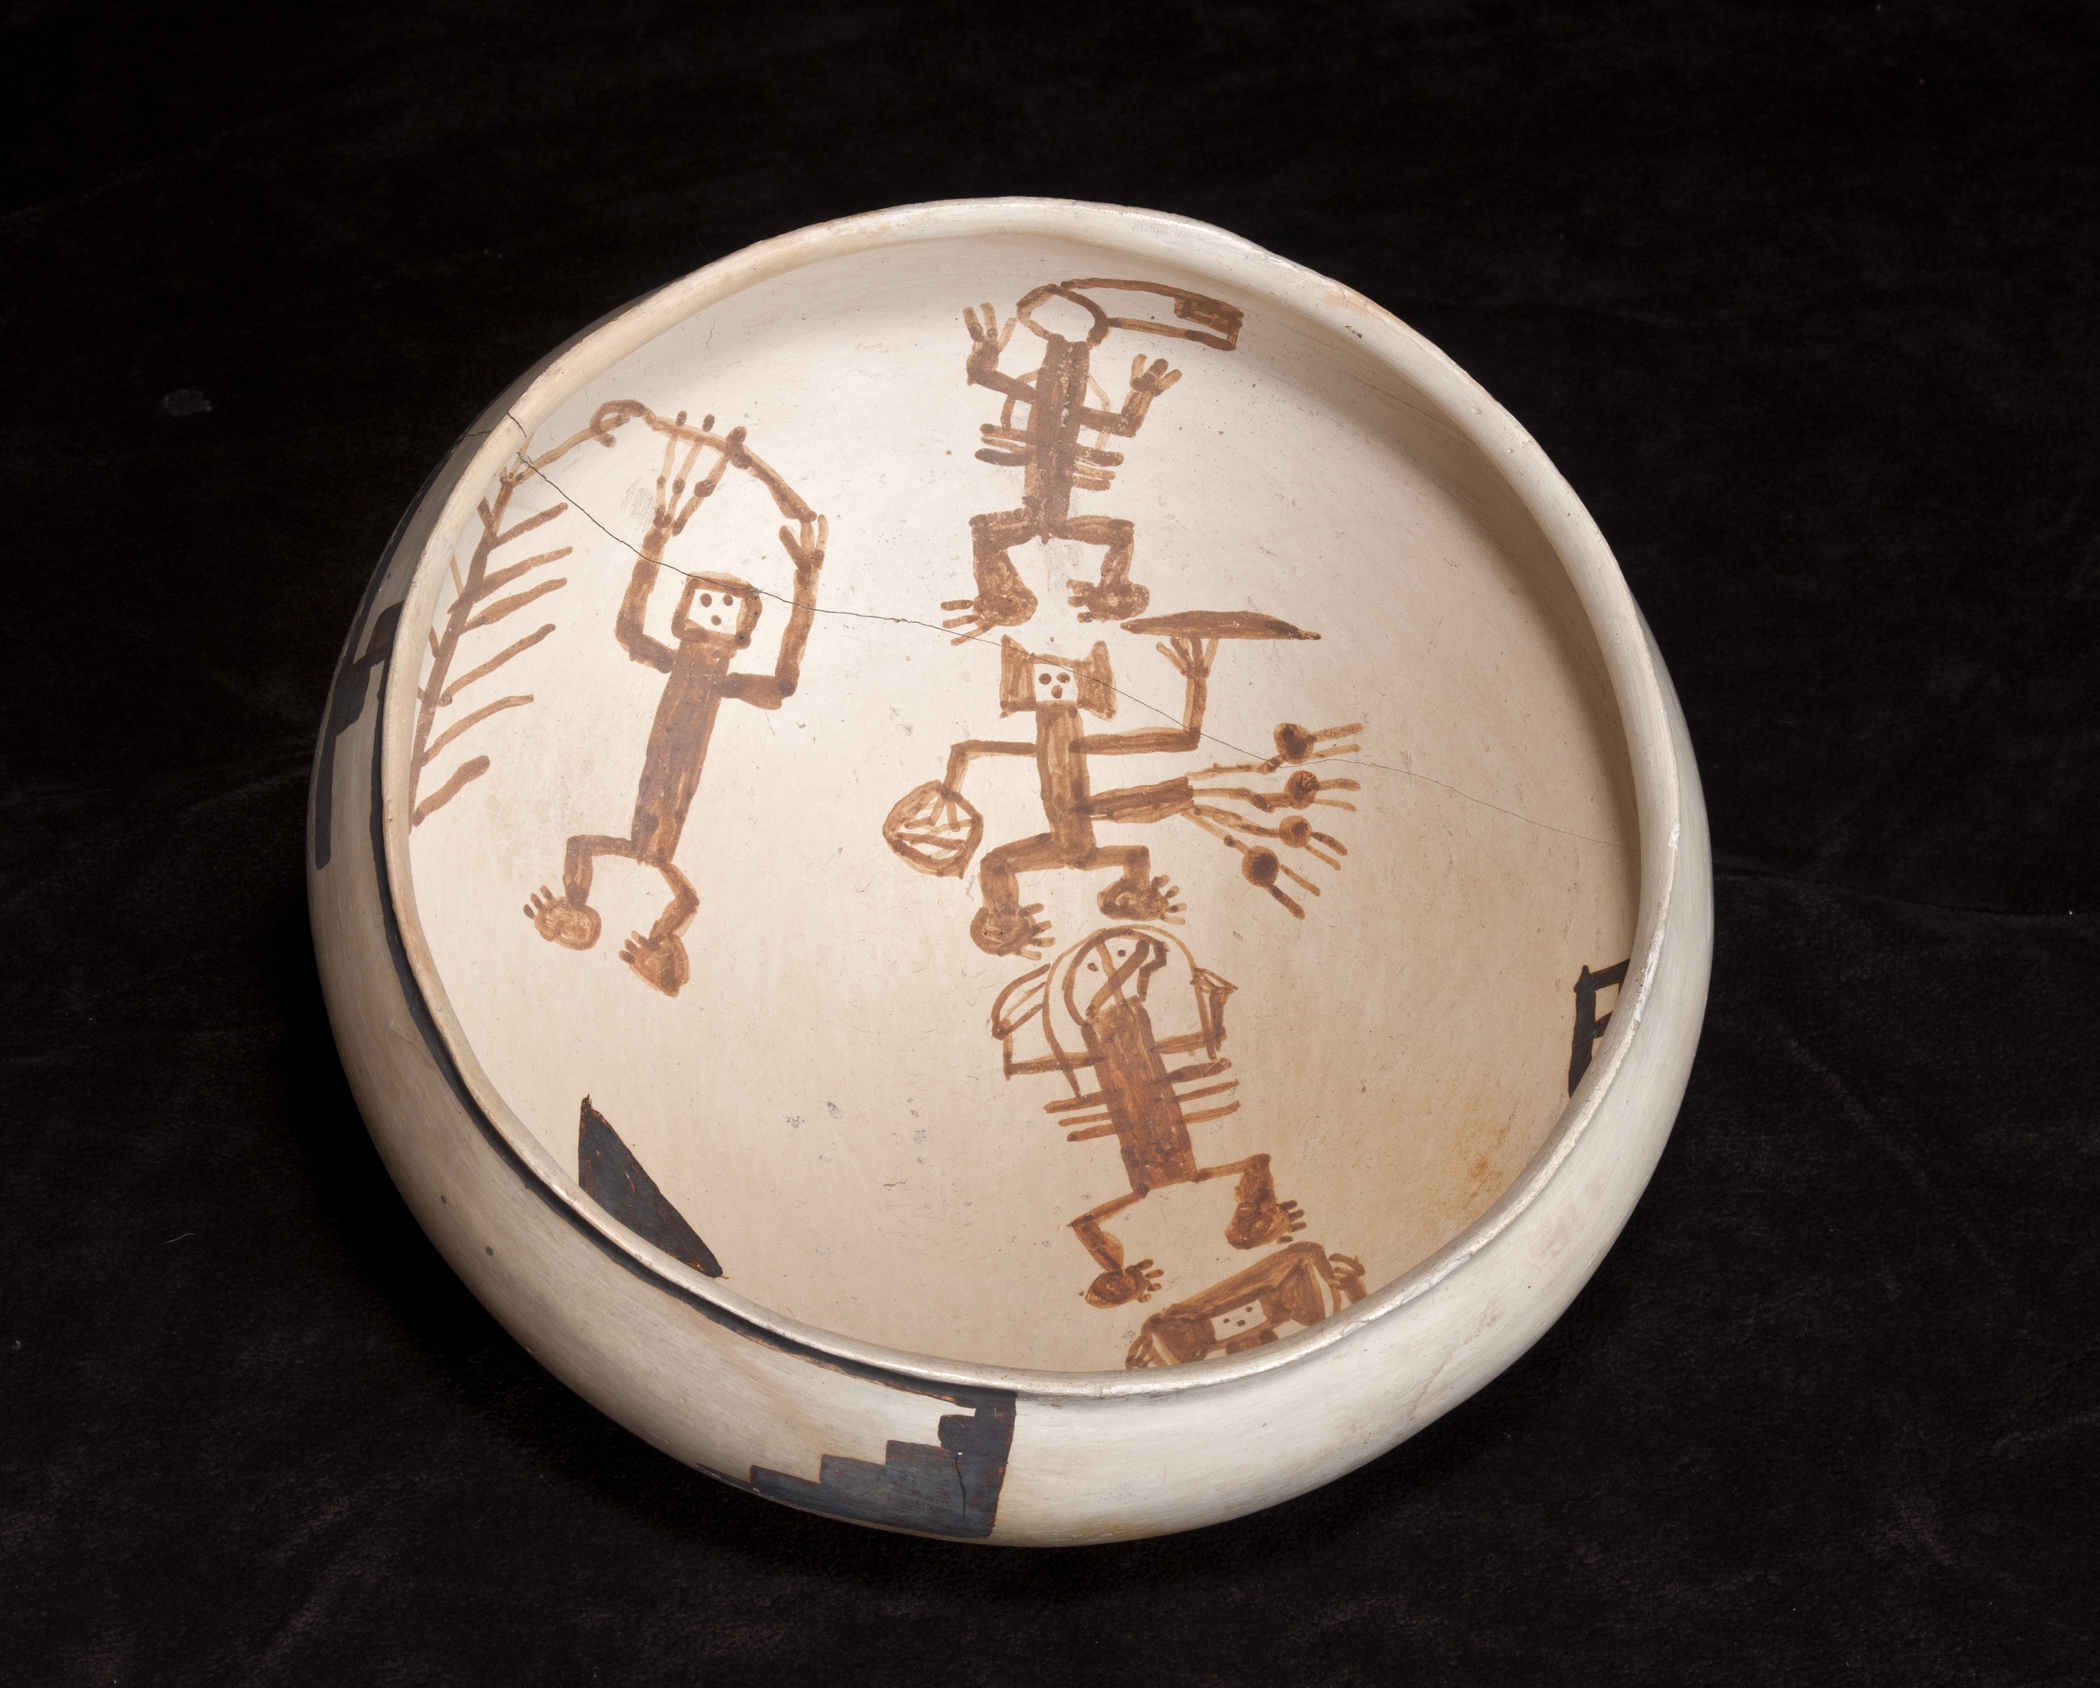 Sikyatki Polychrome Bowl, Ancestral Hopi/northern Arizona, dating to as early as 1425 CE